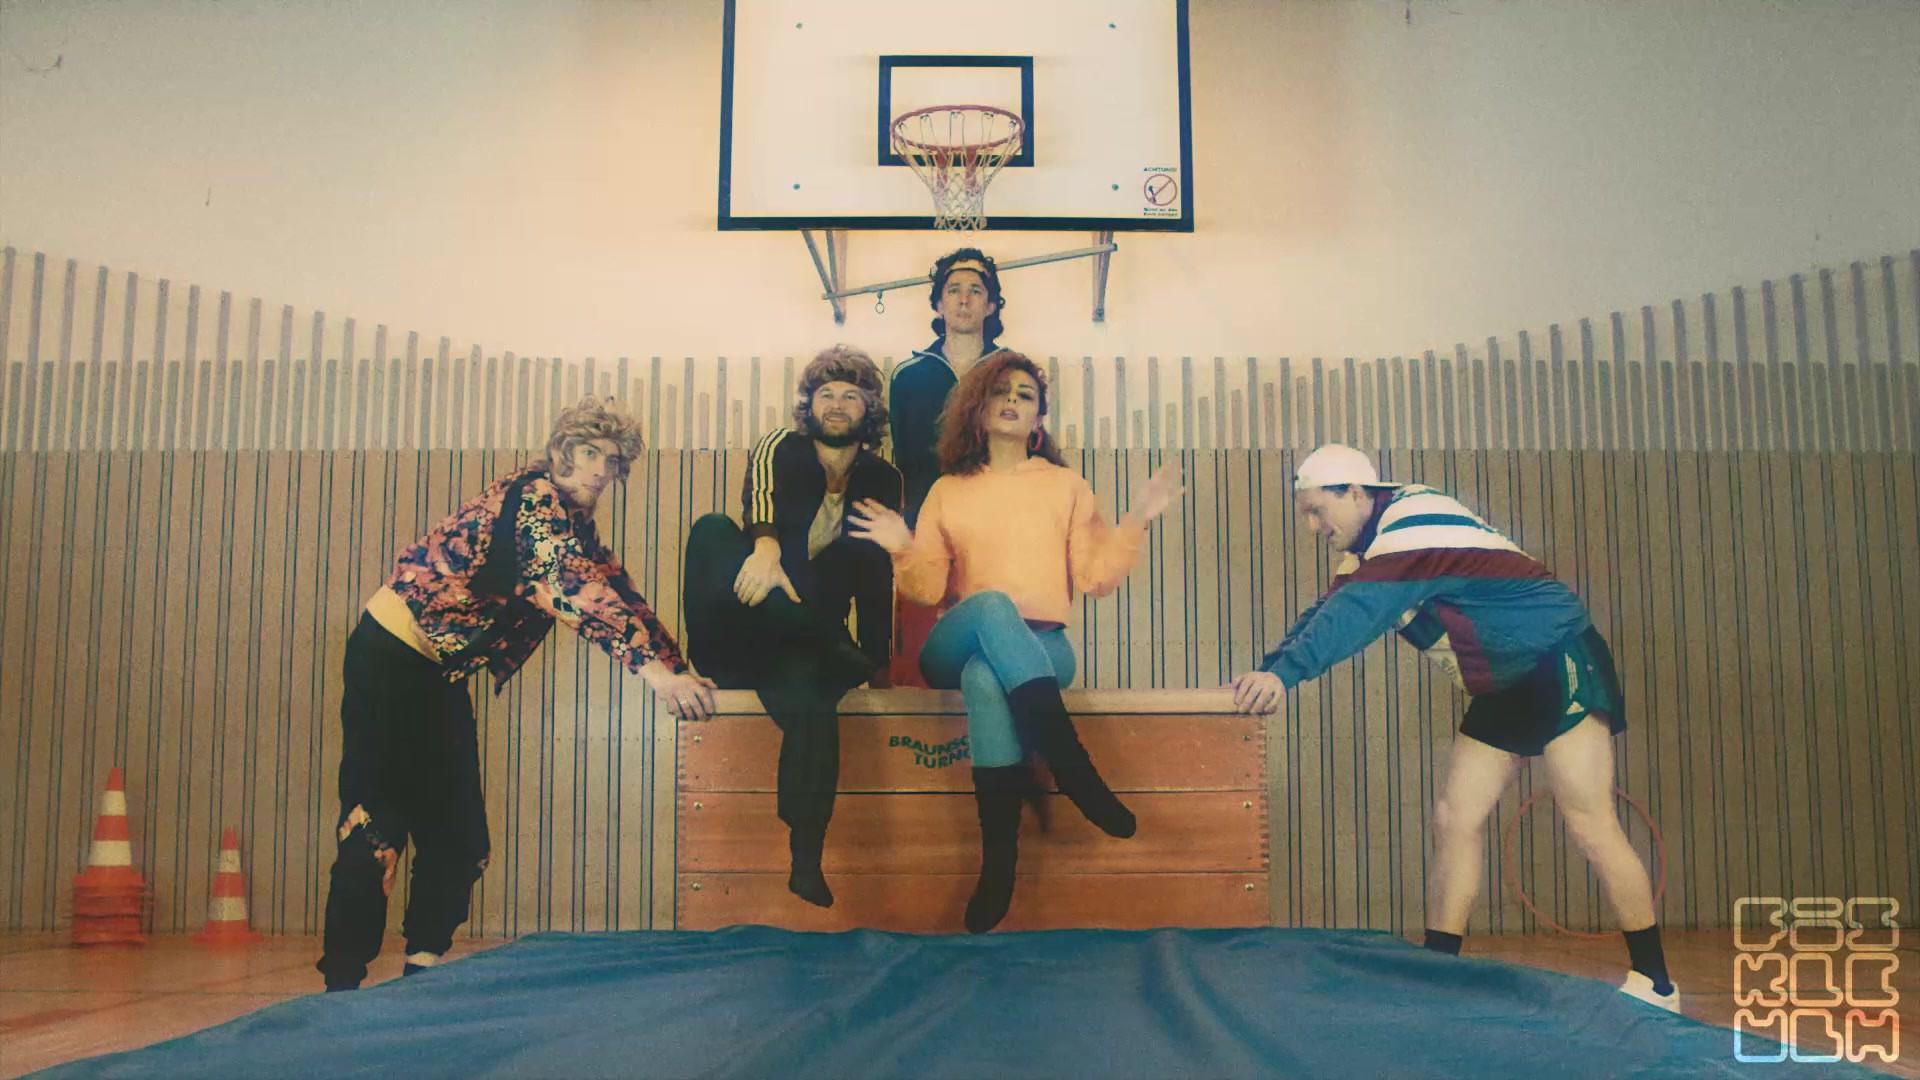 Fischklub ft. Yas Khaleghi Video Release